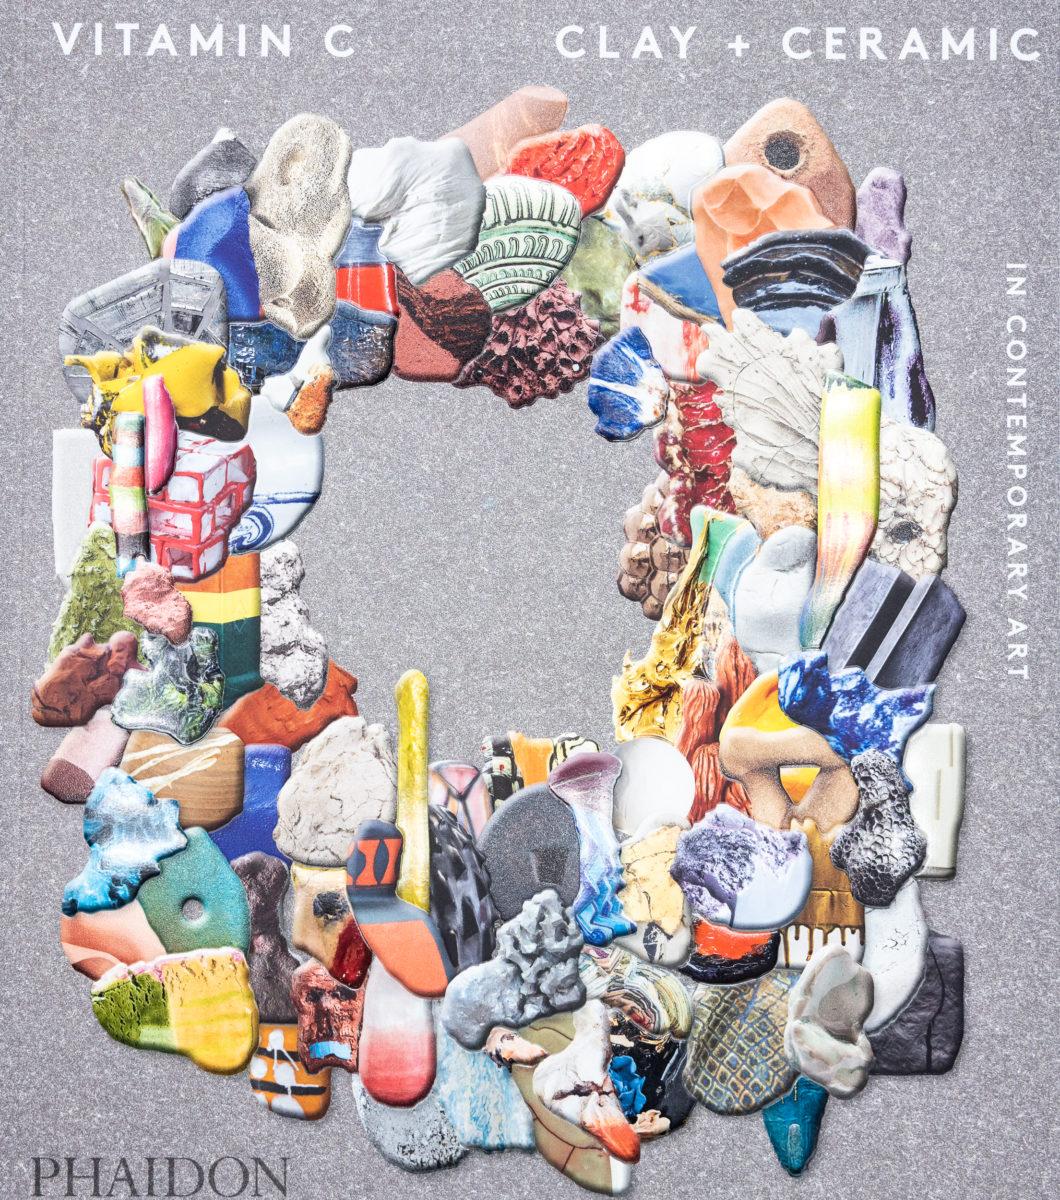 , Vitamin C : Clay and Ceramic in Contemporary Art